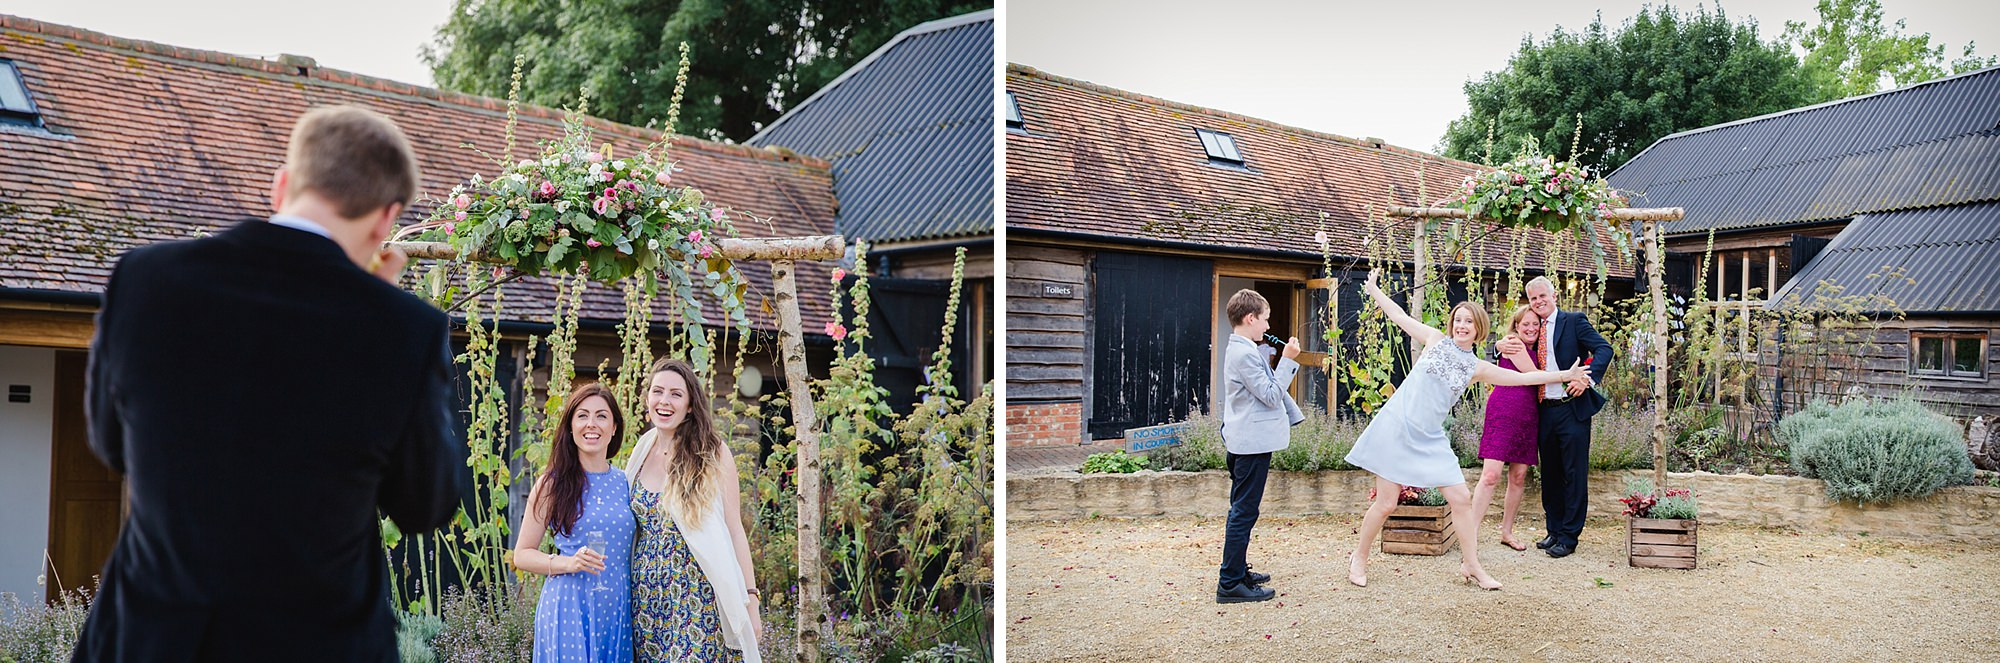 outdoor humanist wedding photography wedding guests